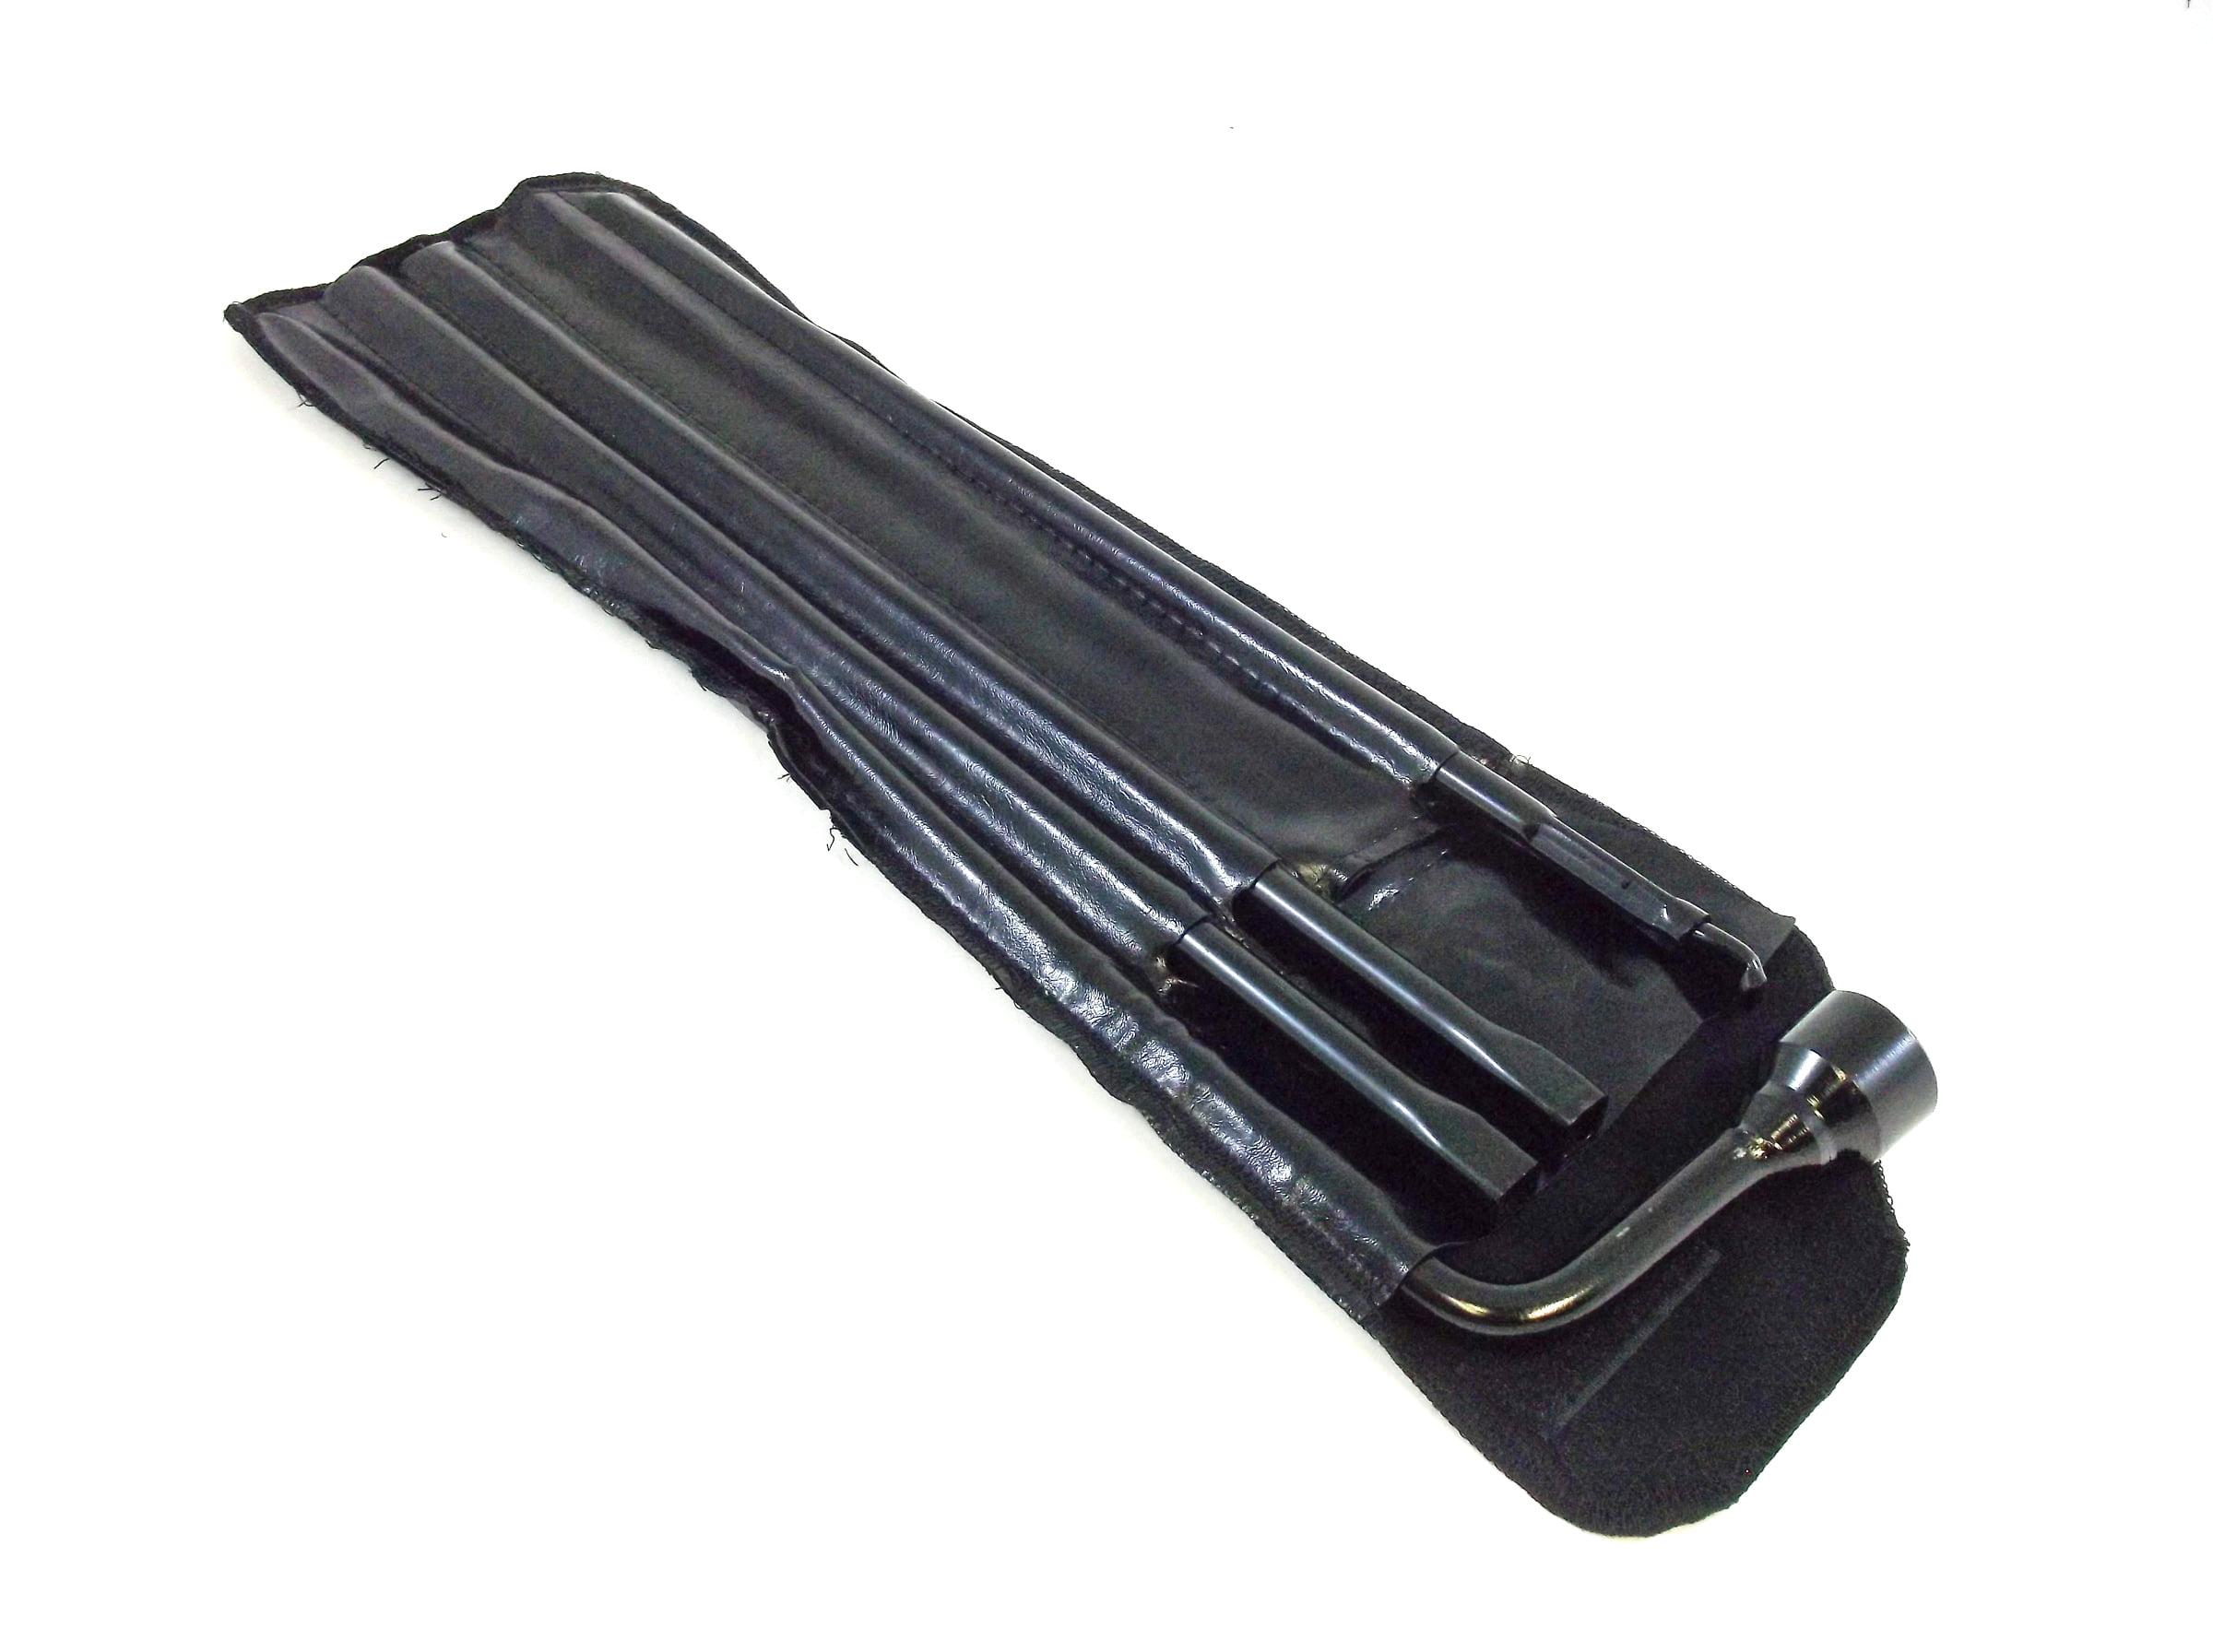 22969370 20782706 22925285 20782708 Replace 22969377 OEM Lug Nut Repair Tools Kit with Bag Autofu Spare Tire Wrench Set Fits 2000-2014 Chevy Silverado // 2000-2014 GMC Sierra